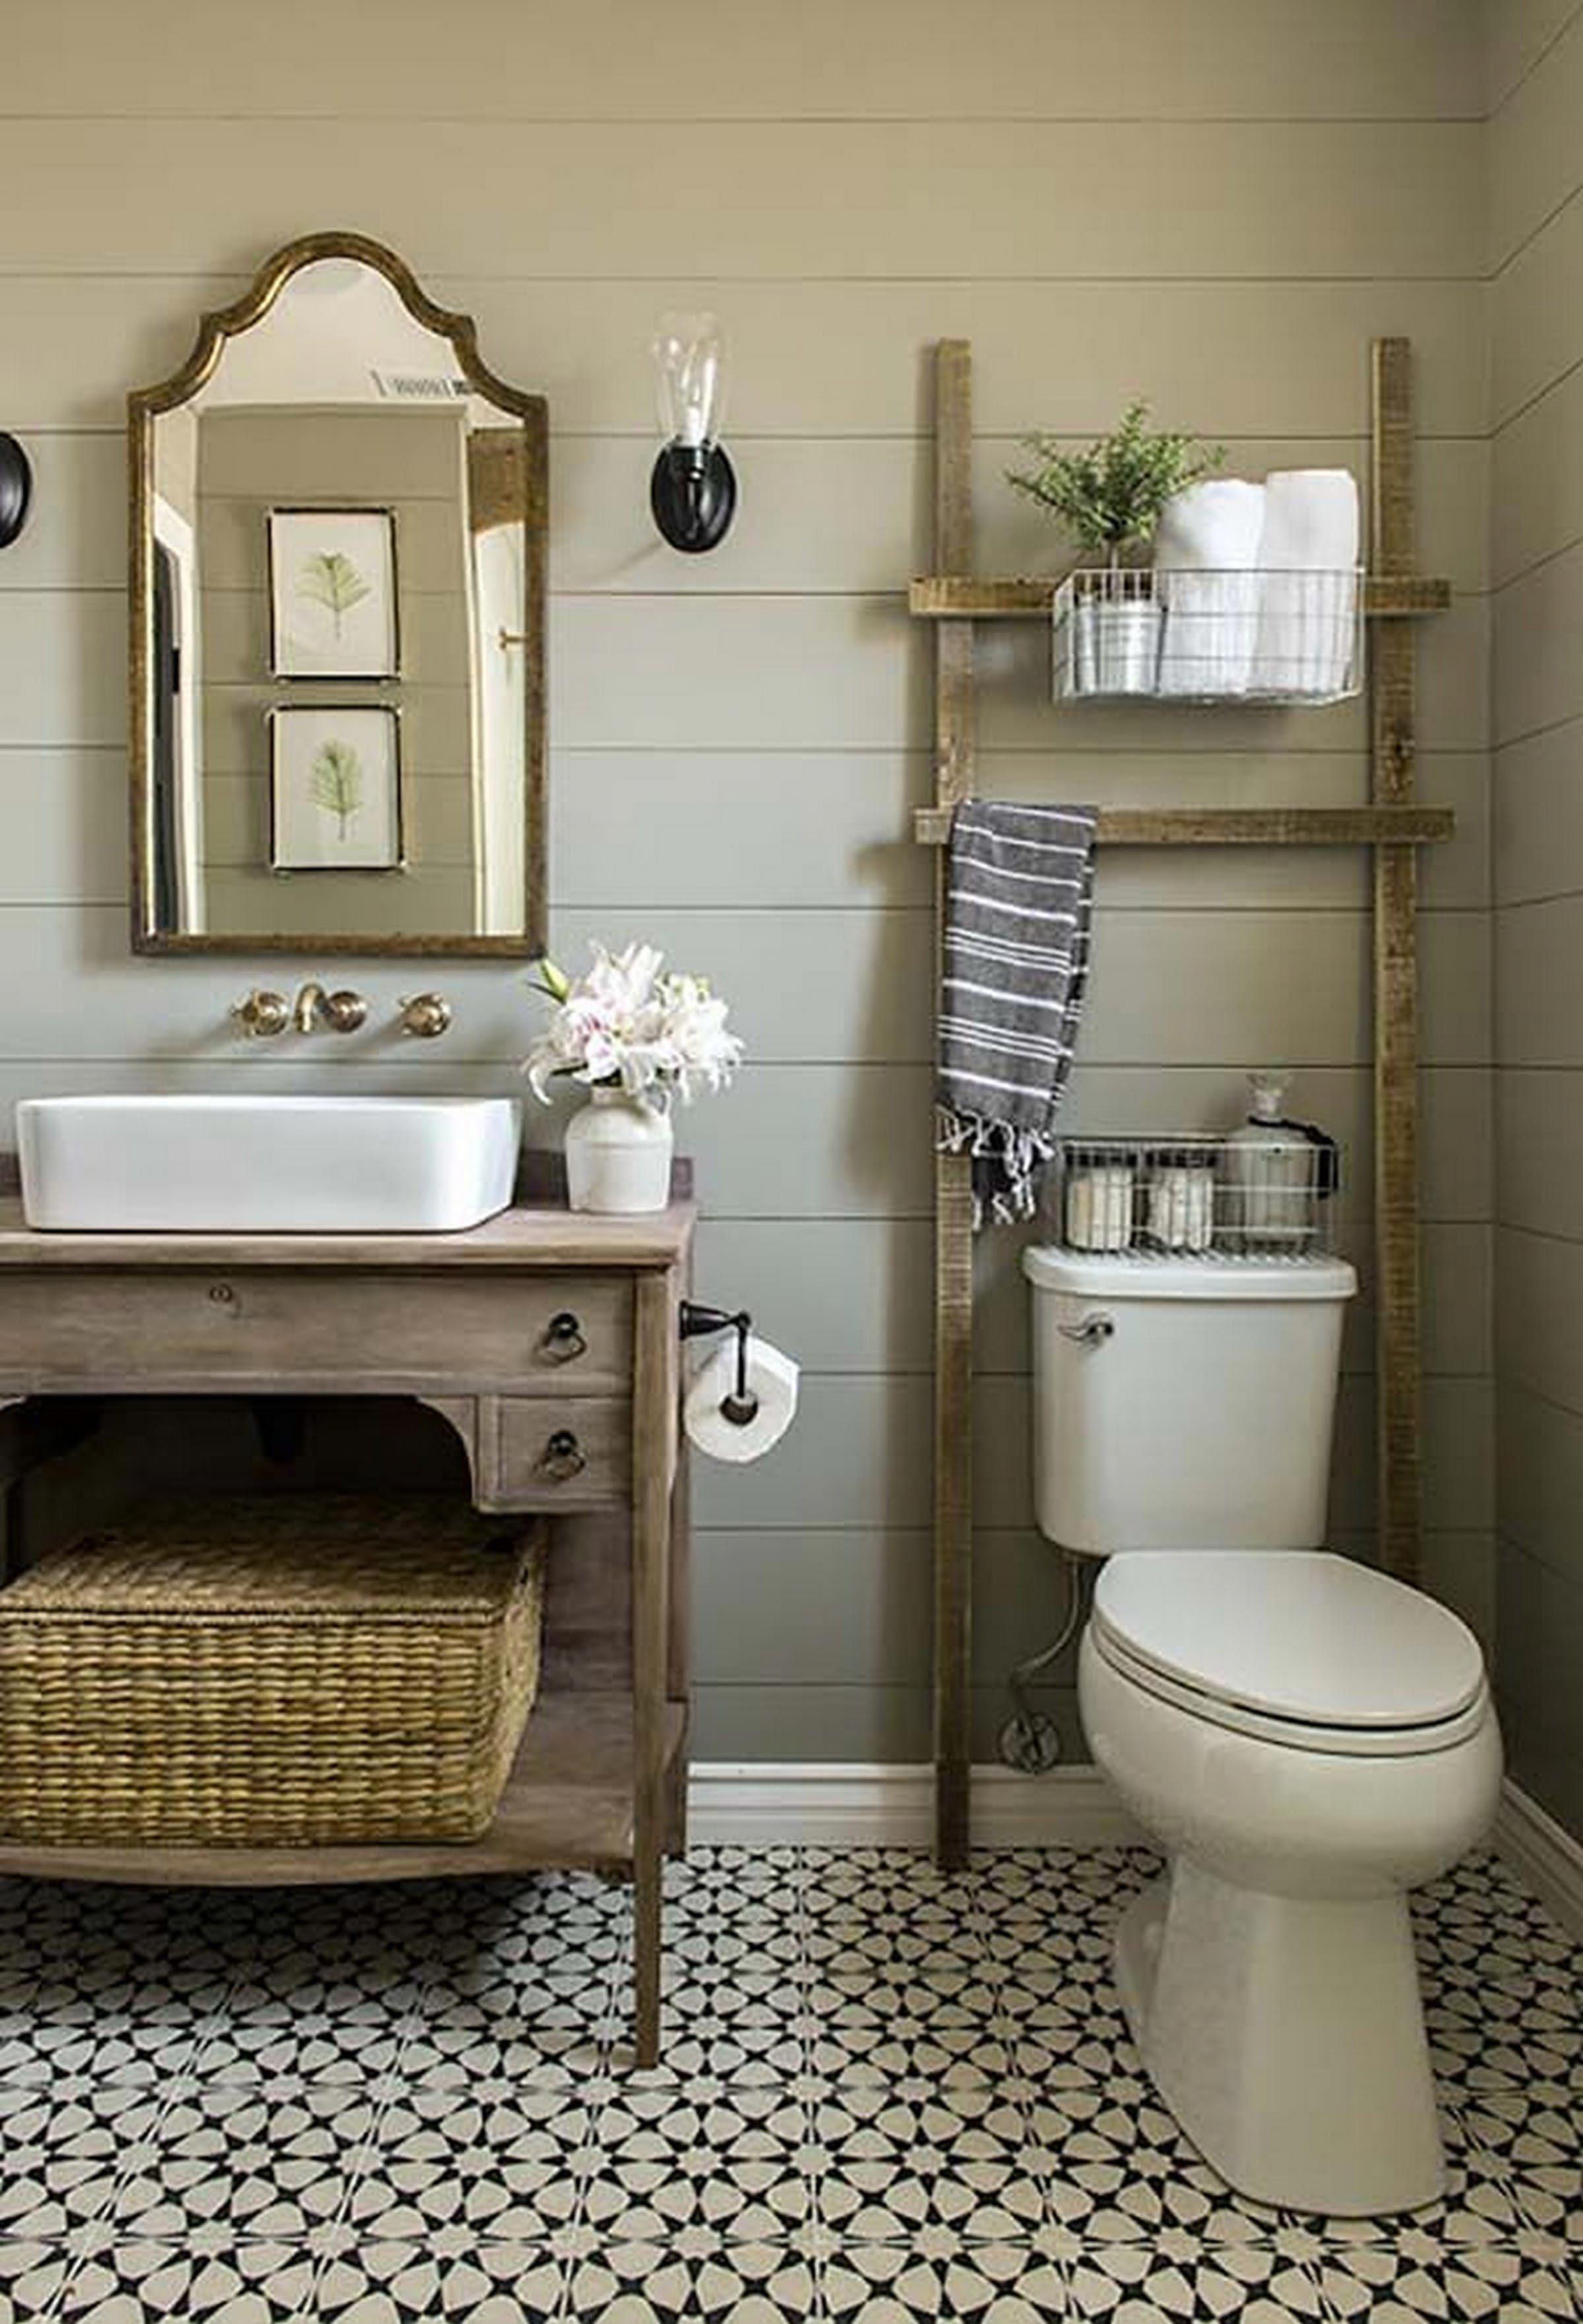 Obtain a lot more information on Easy Diy Bathroom Remodel in 5